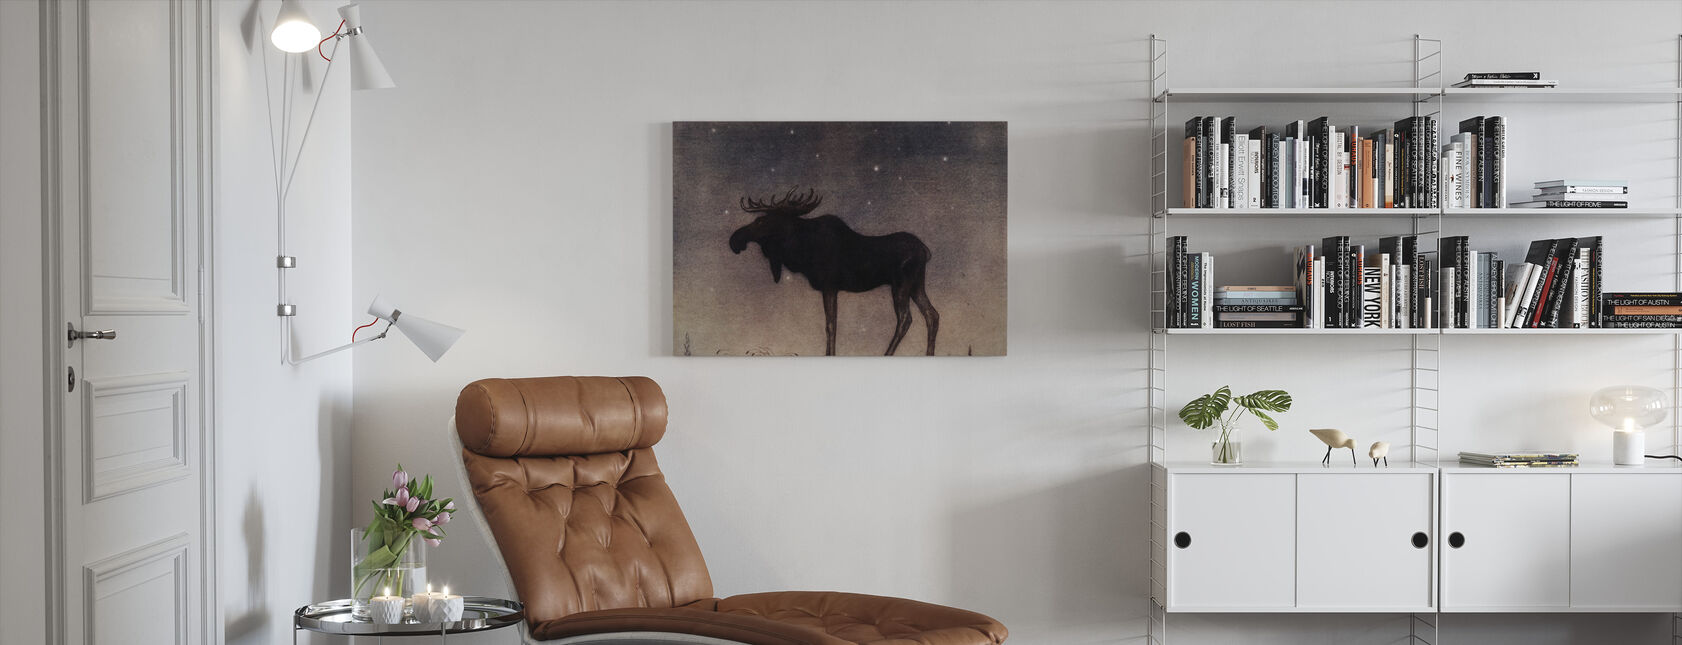 John Bauer - Älgtjuren - Canvastavla - Vardagsrum